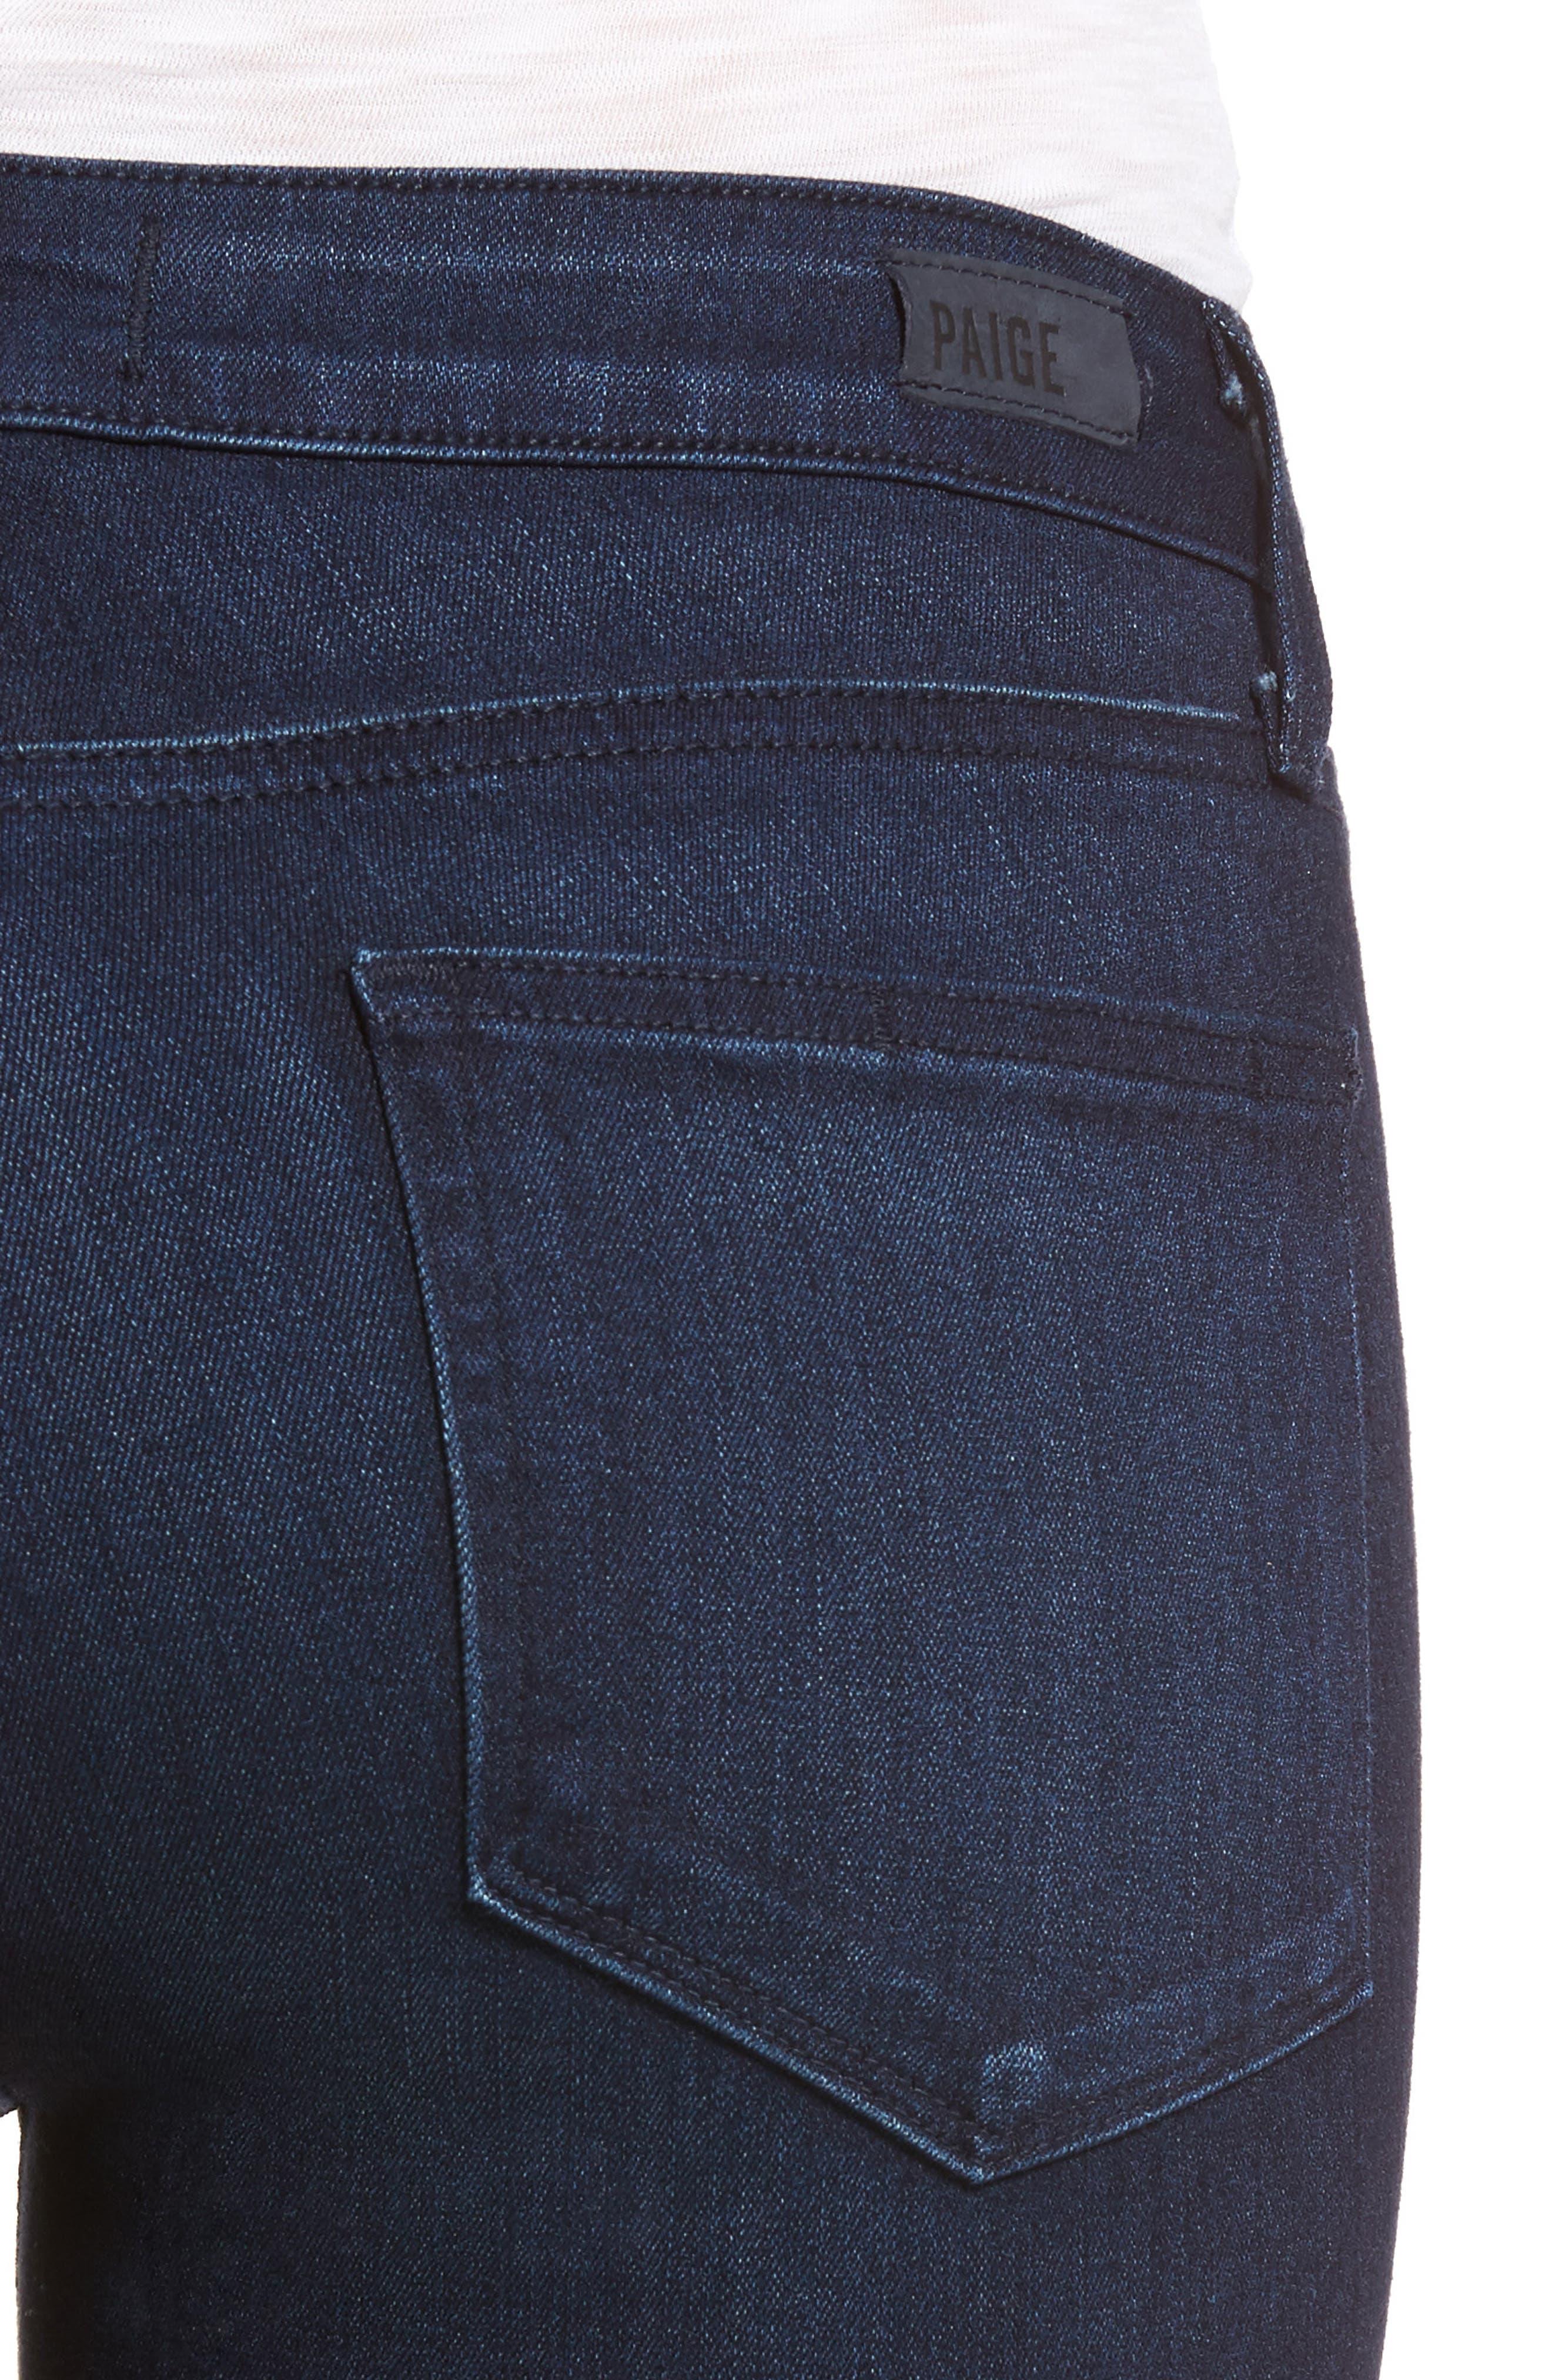 Verdugo Ankle Skinny Jeans,                             Alternate thumbnail 4, color,                             400